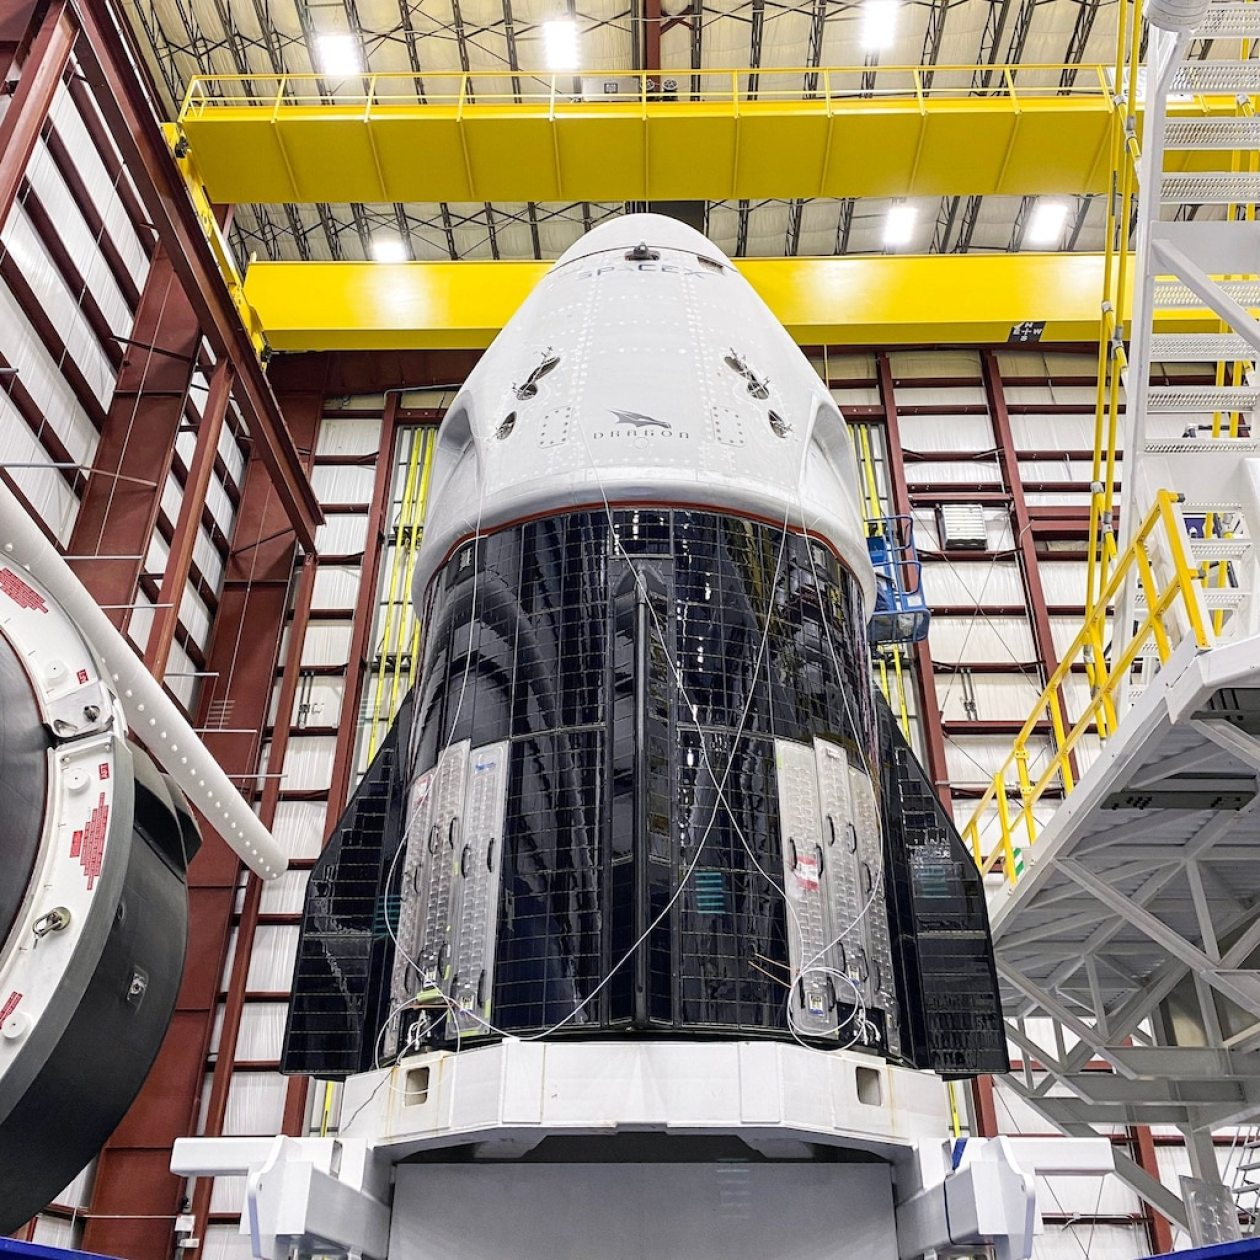 spacex crew dragon spaceship demo2 demo 2 hangar kennedy space center ksc EYgh5jHX0AU9m8V